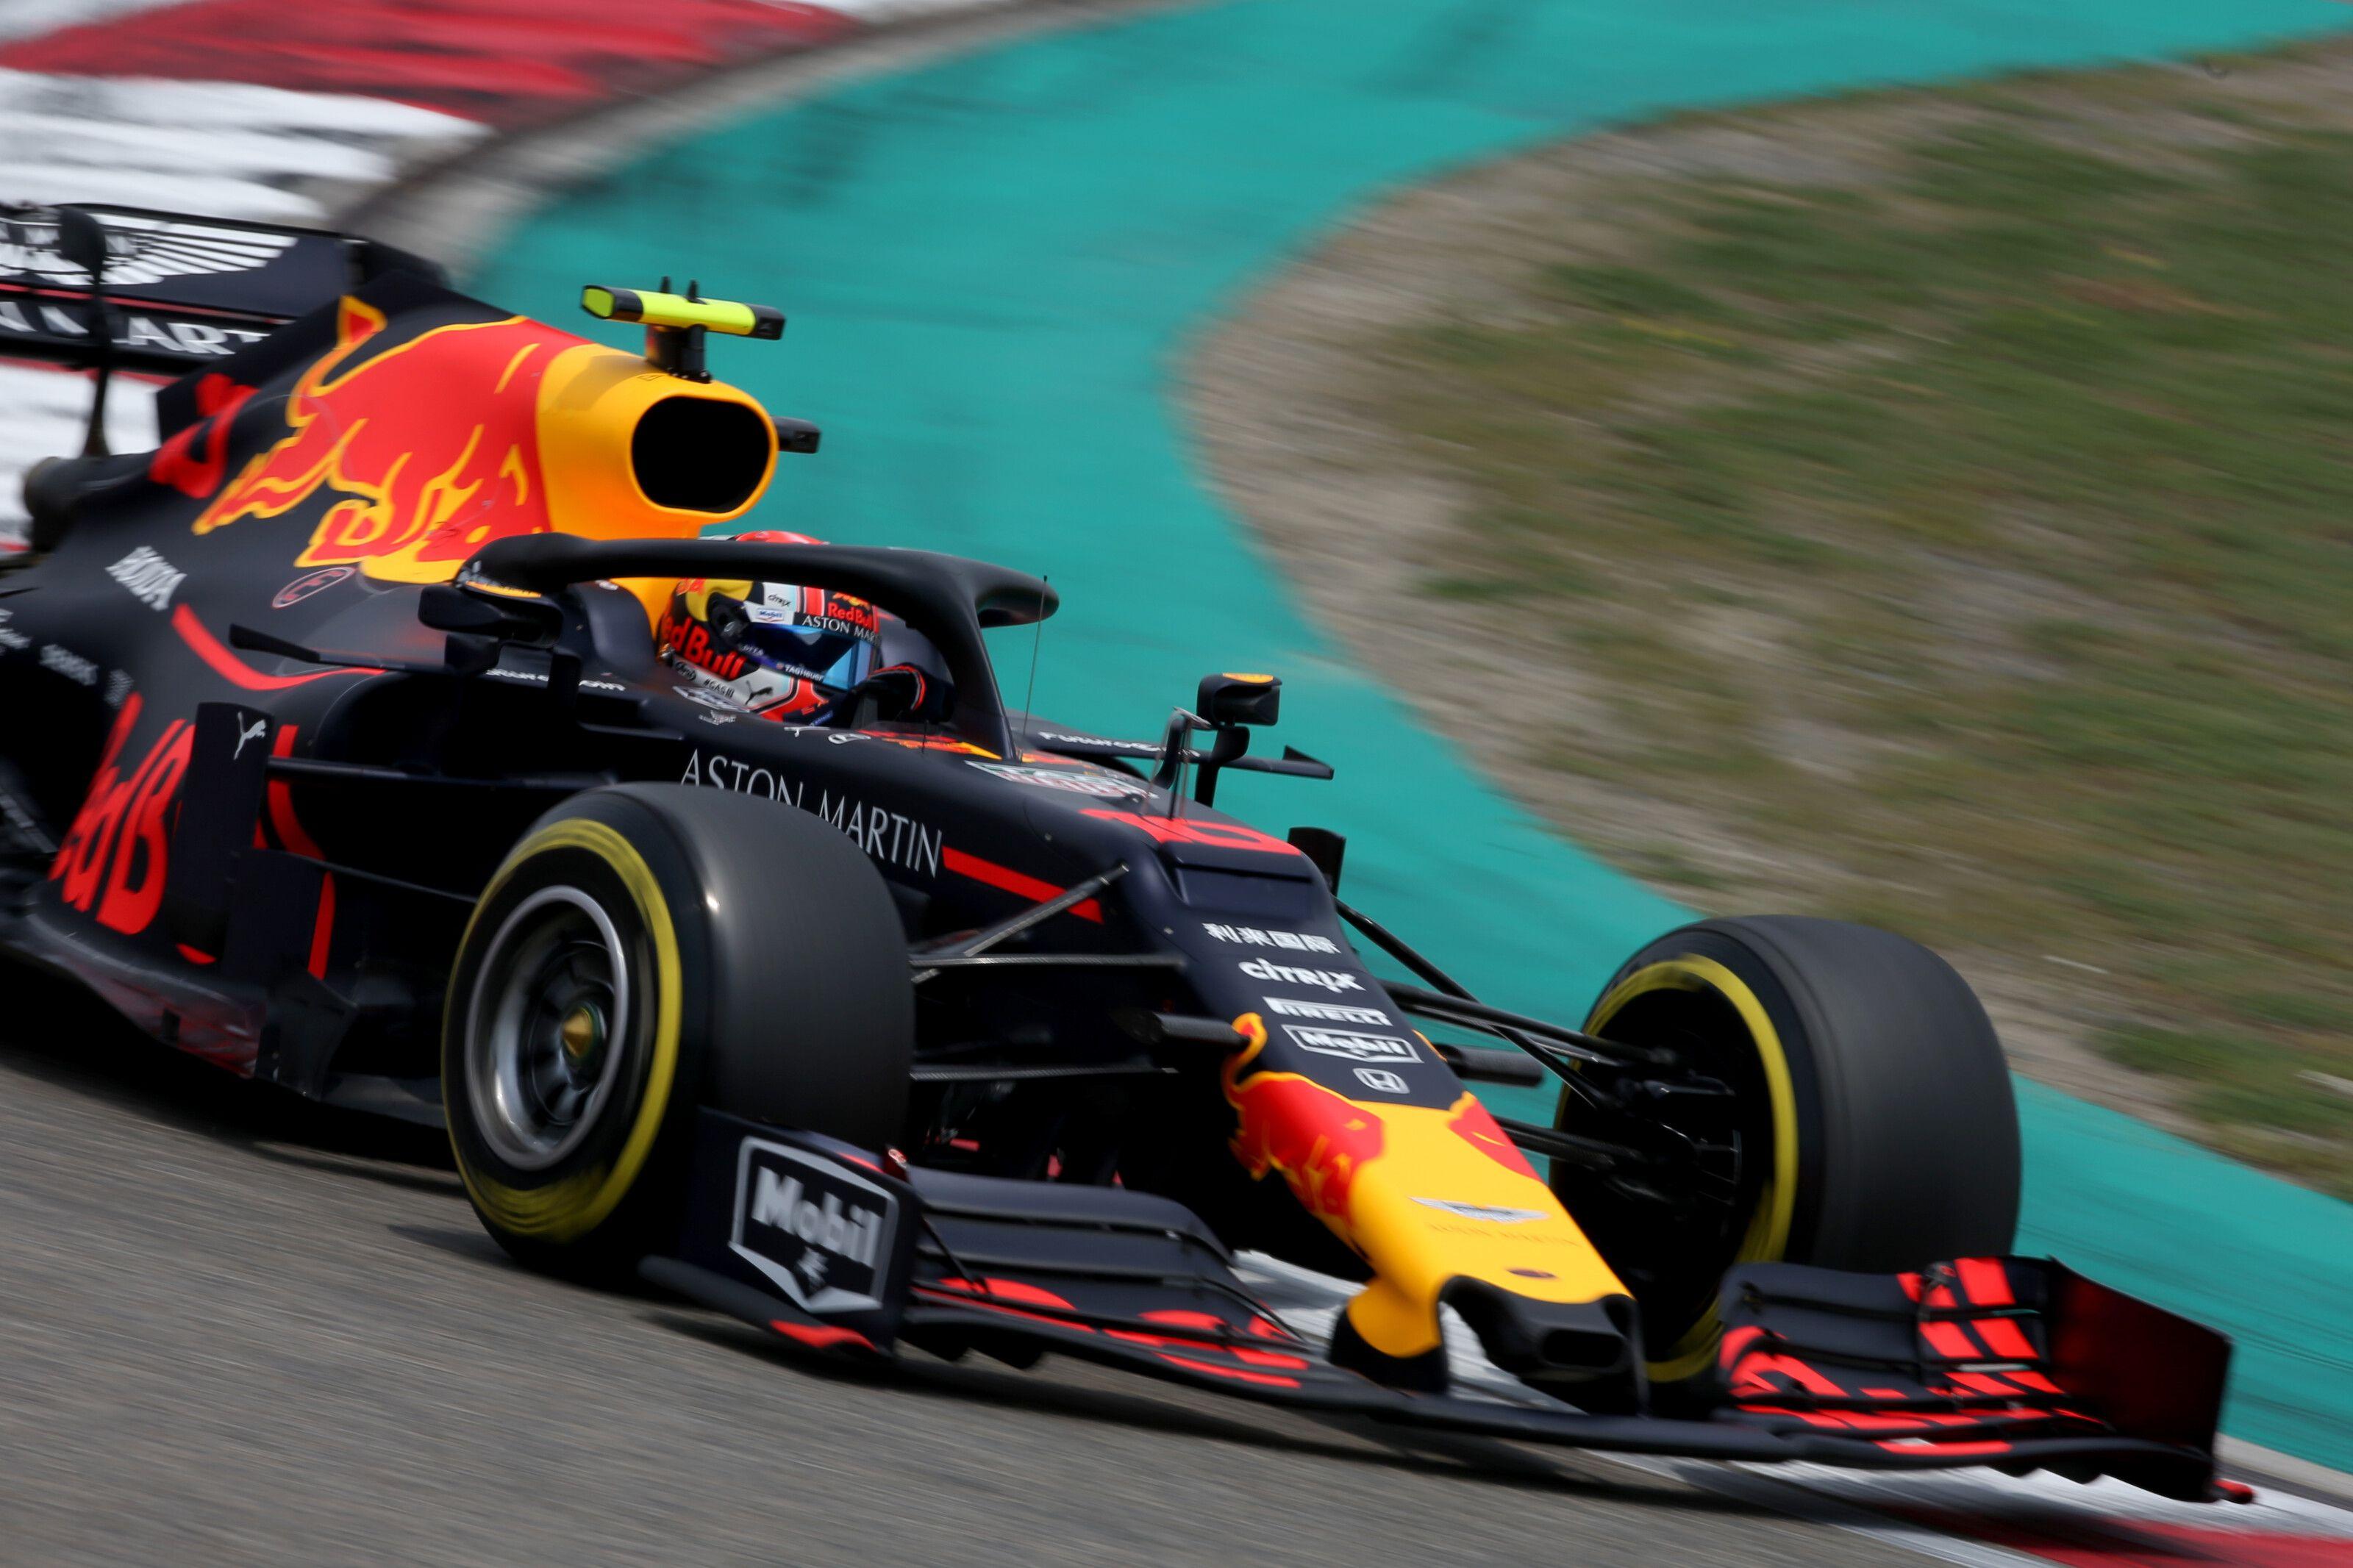 Austrian GP, Pirelli